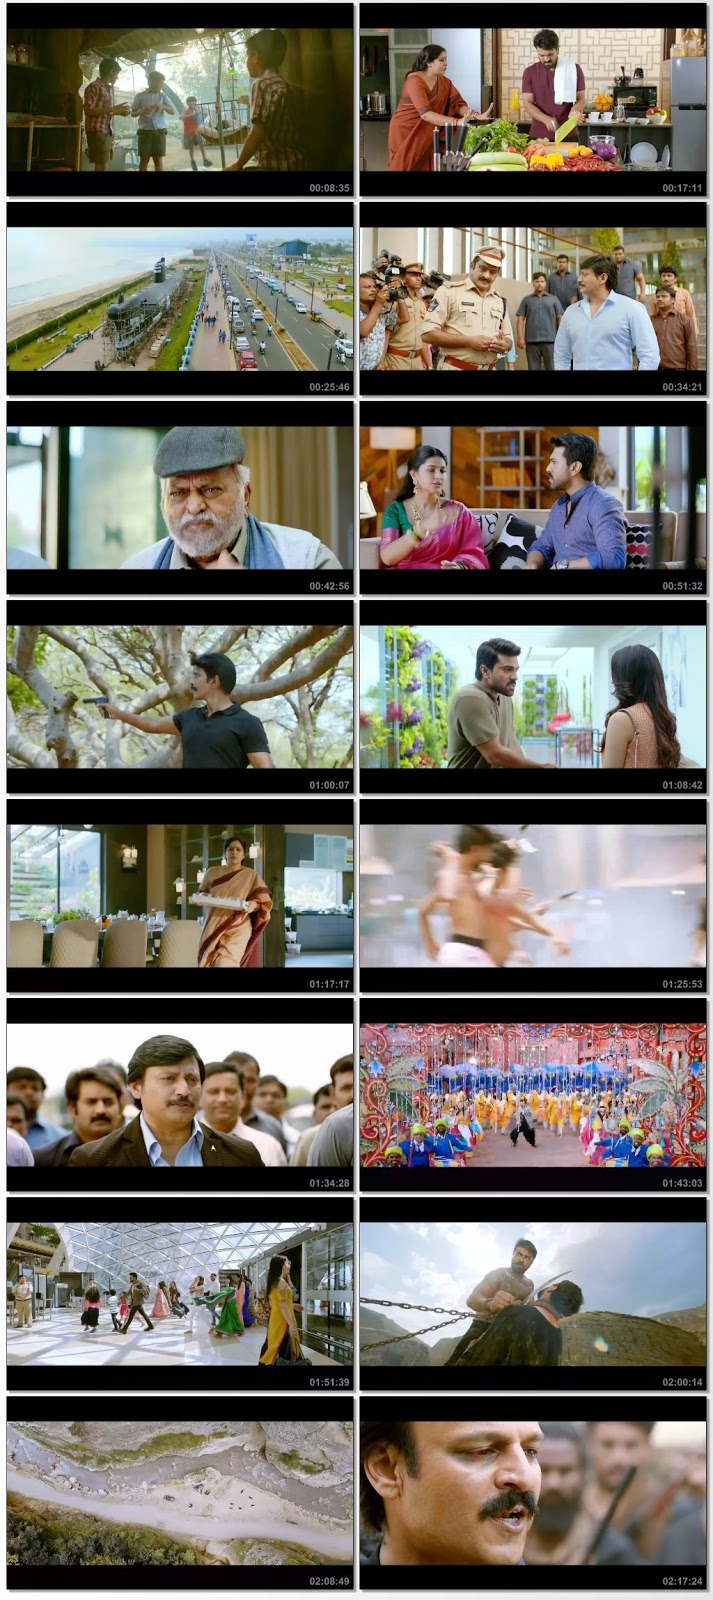 vinaya vidheya rama movie download free, vinaya vidheya rama movie download 480p, vinaya vidheya rama movie download 720p, vinaya vidheya rama movie download in hindi